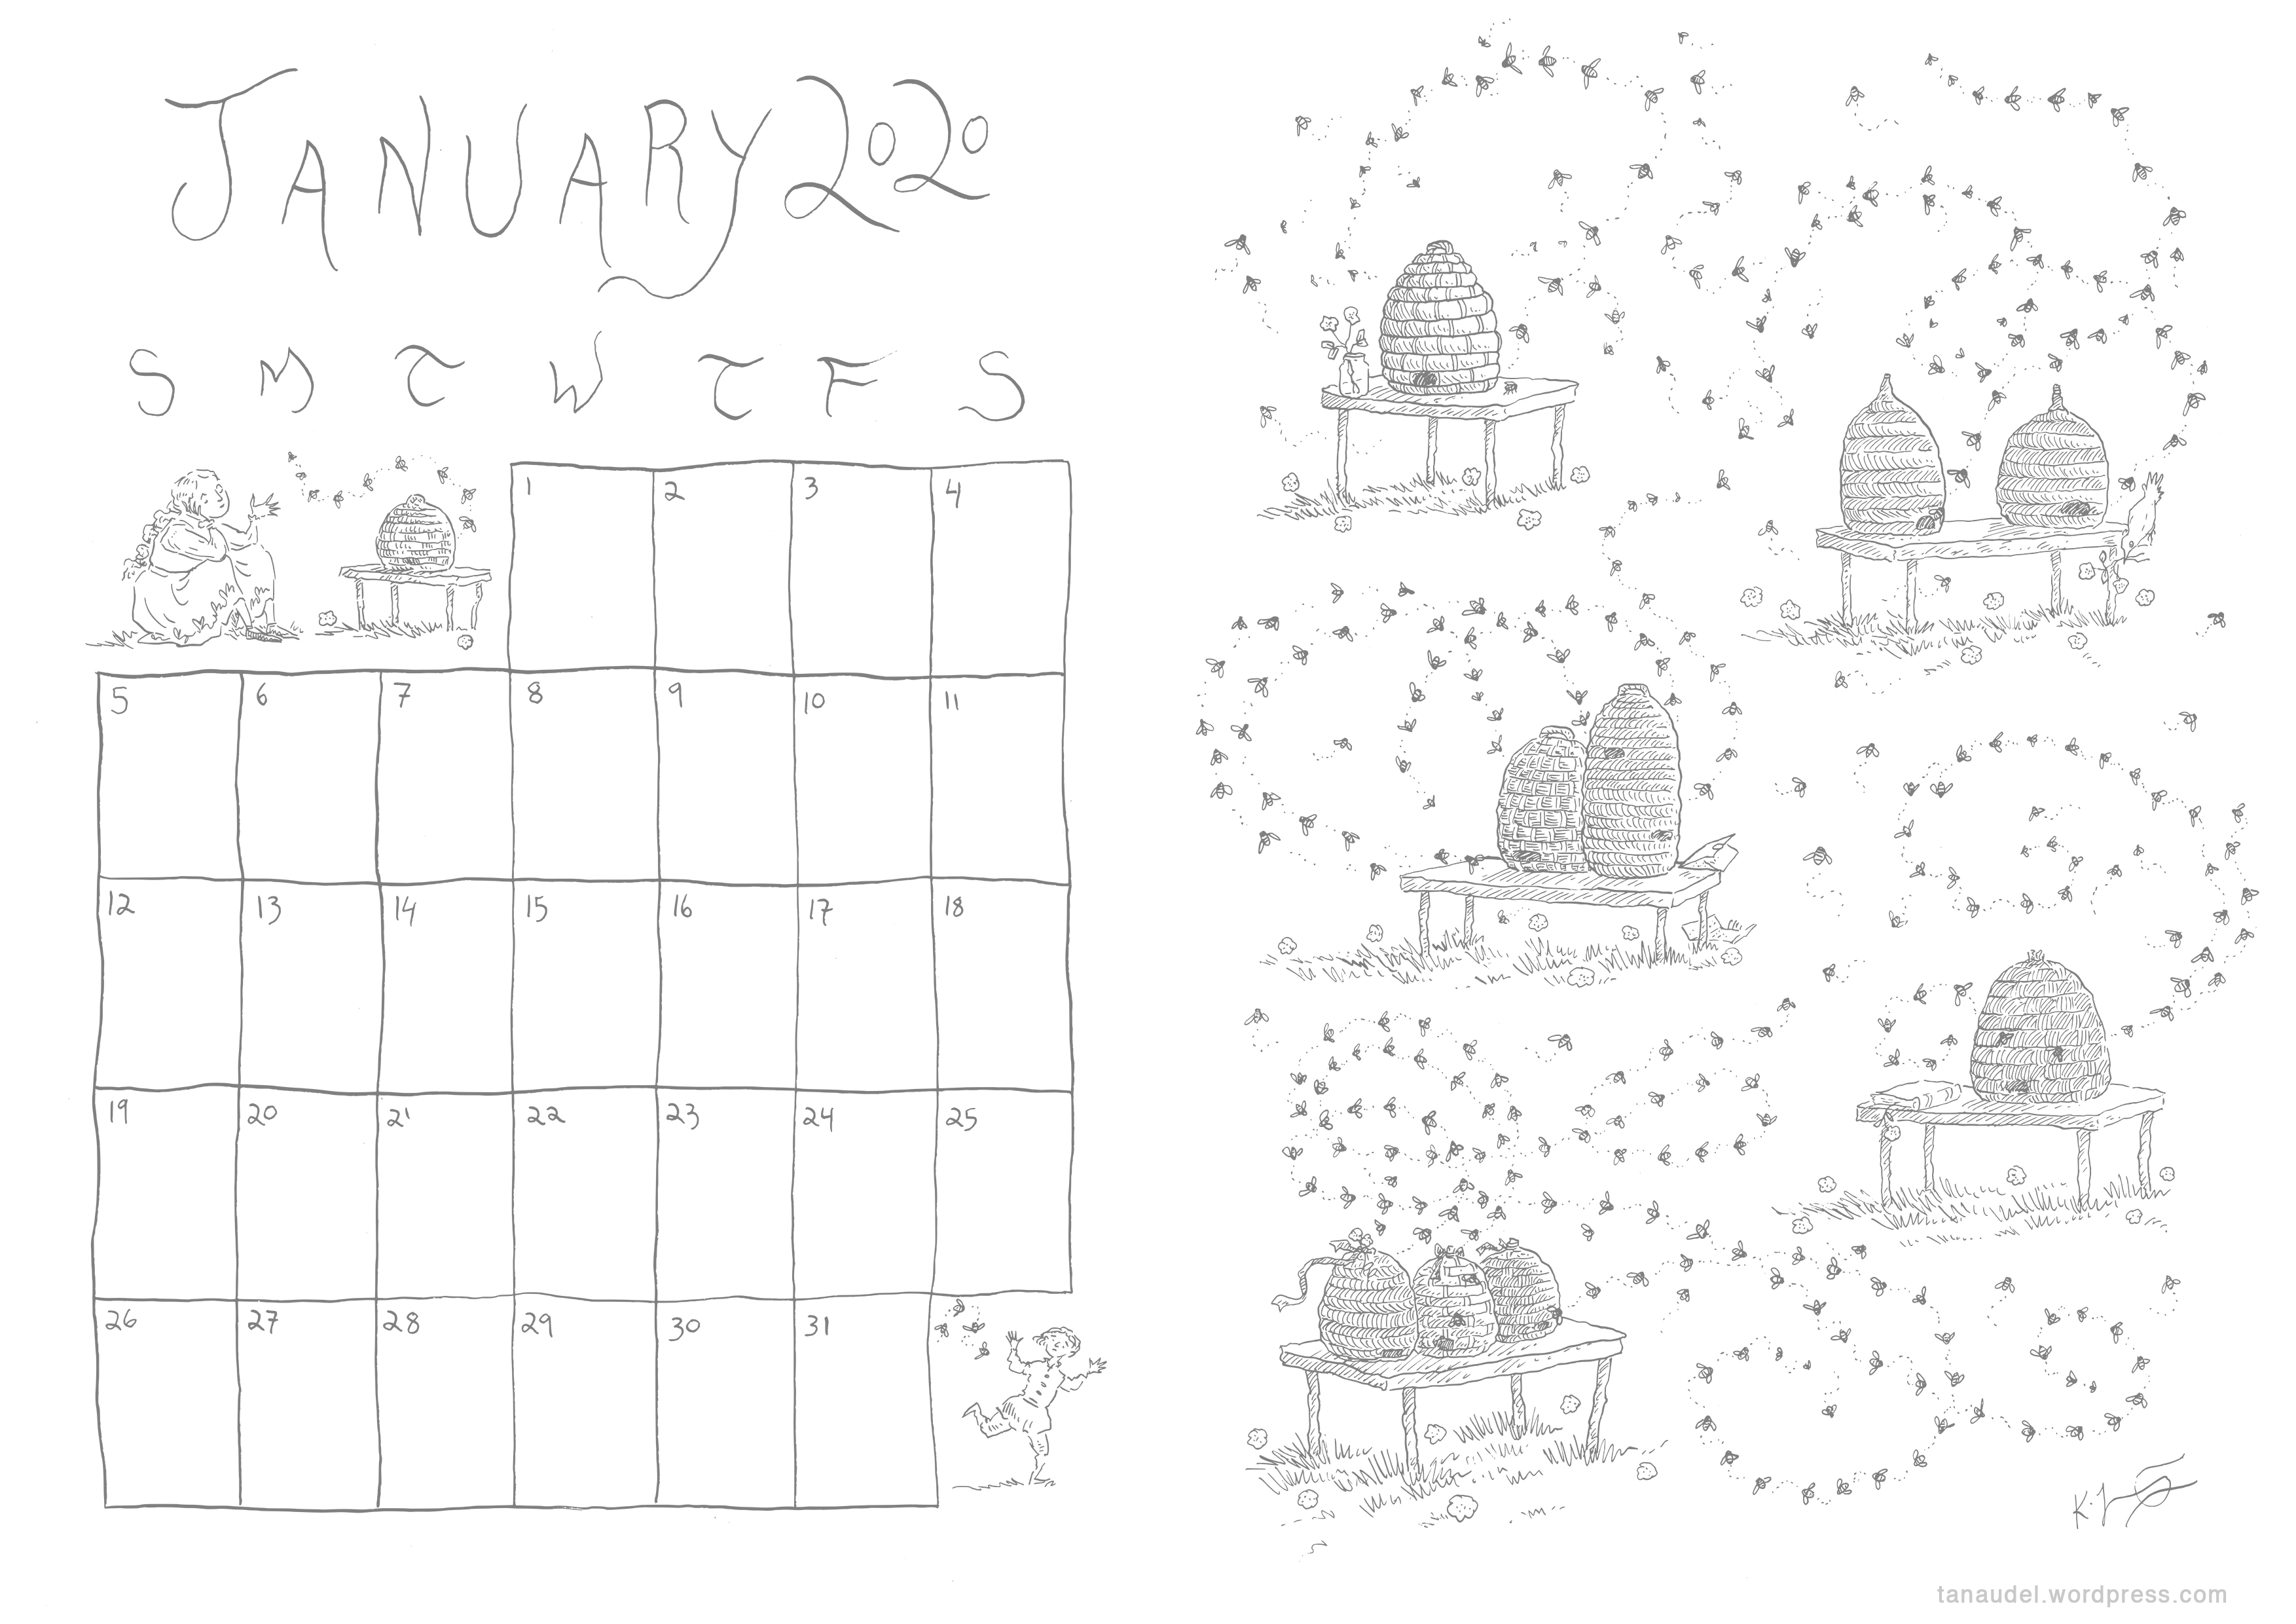 January Calendar - Lines